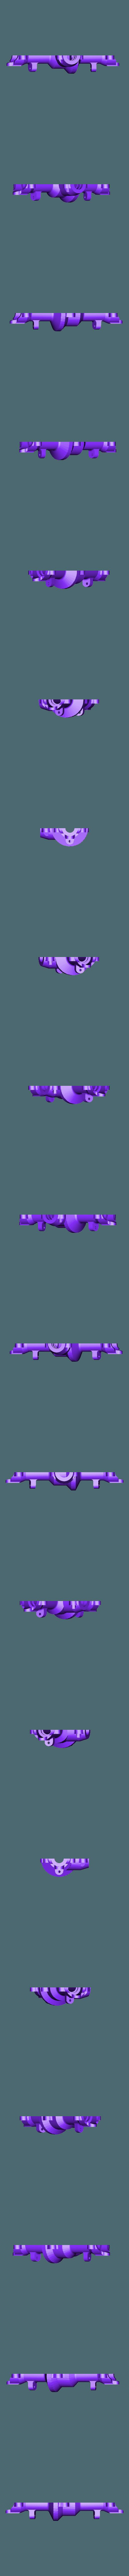 TruckV3_Axle_front_bottom.STL Download STL file 3D Printed RC Truck V3 • 3D print model, MrCrankyface